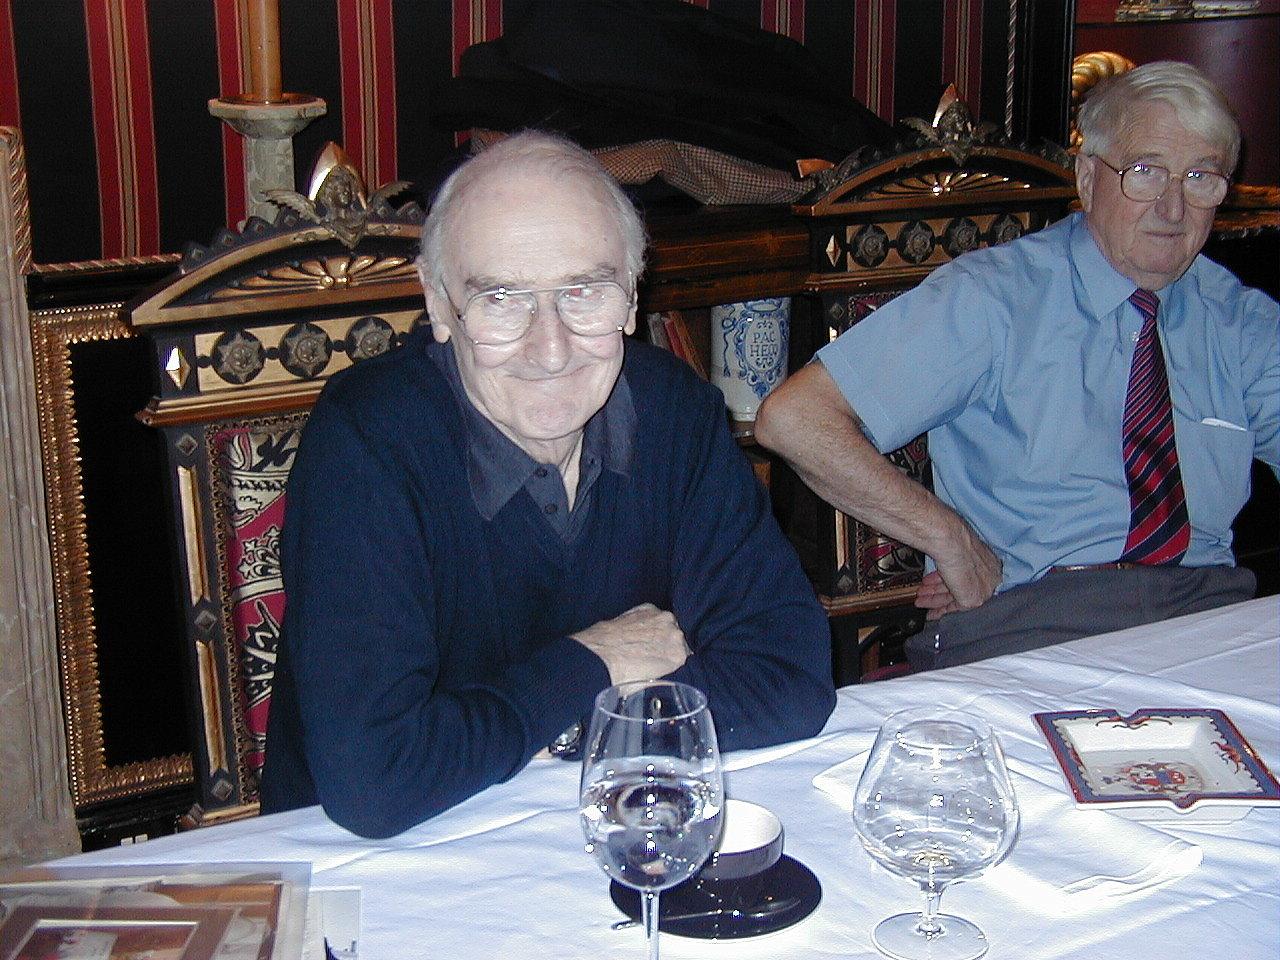 Prestonfield House, Edinburgh.Ian Stewart the late Bill Dobson, his fellow Ecurie Ecosse driver, on right.